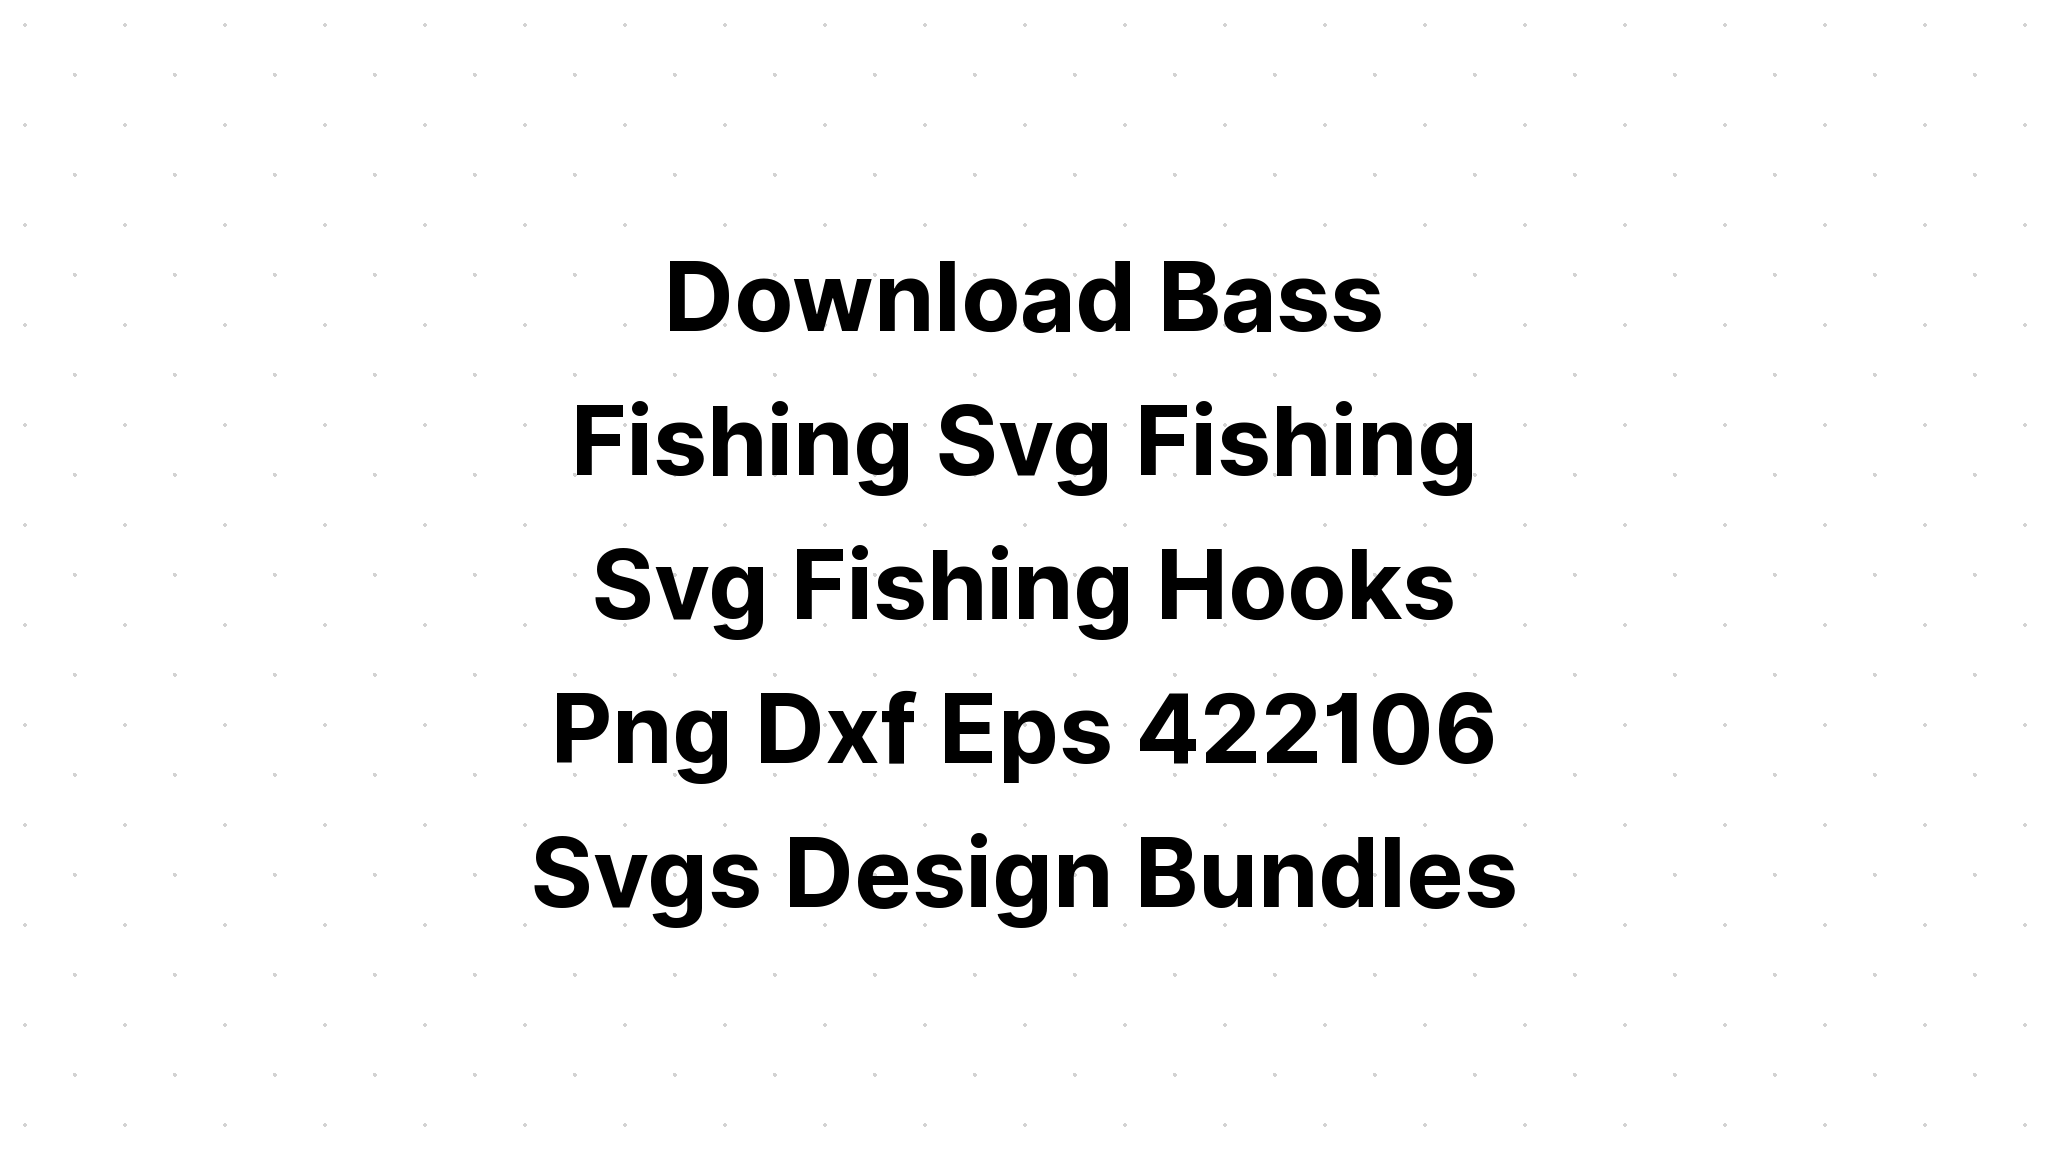 Download Fishing Hook Sizes Svg File